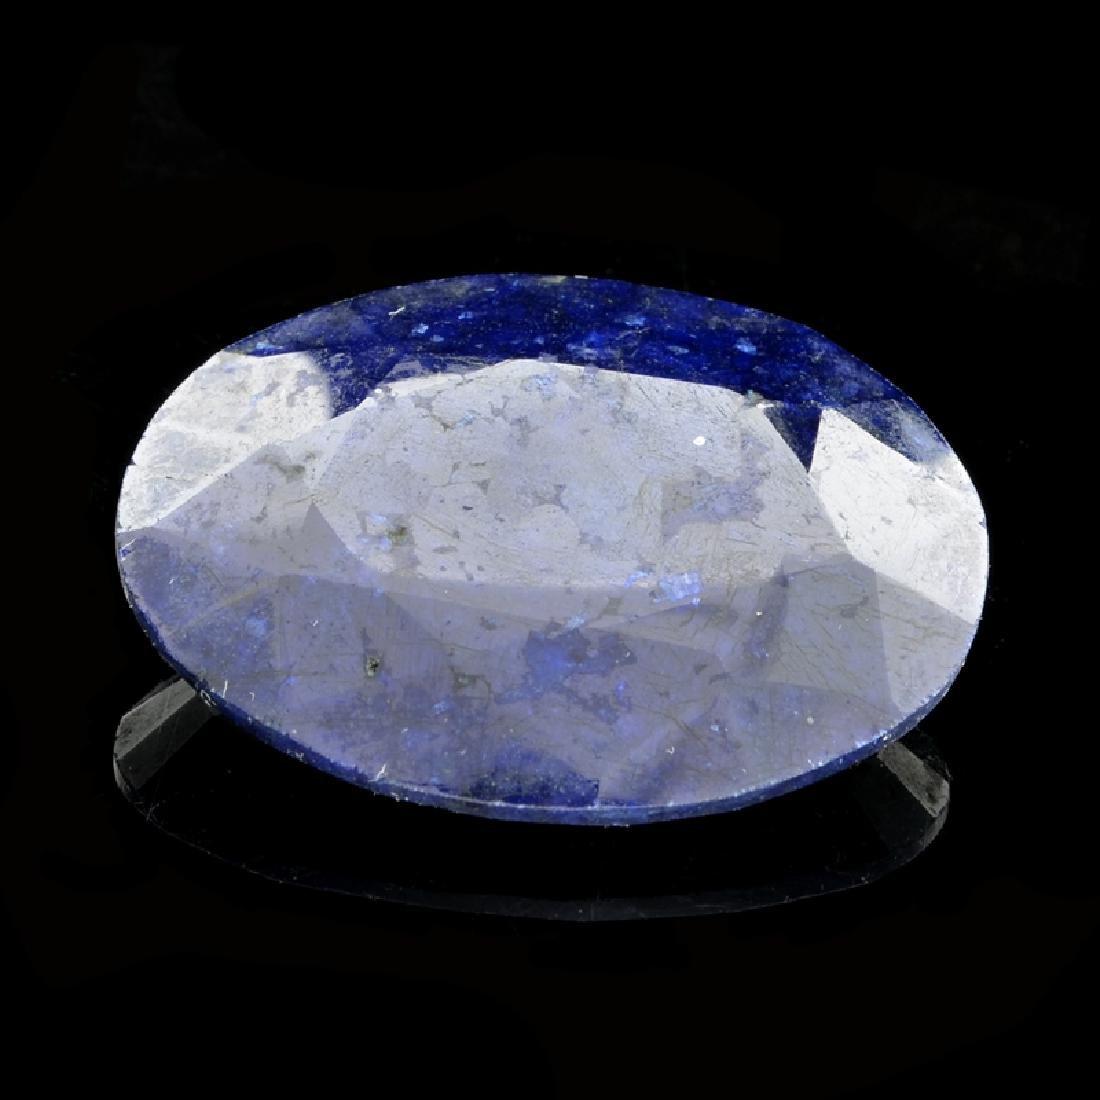 113.30CT Oval Cut Blue Sapphire Gemstone